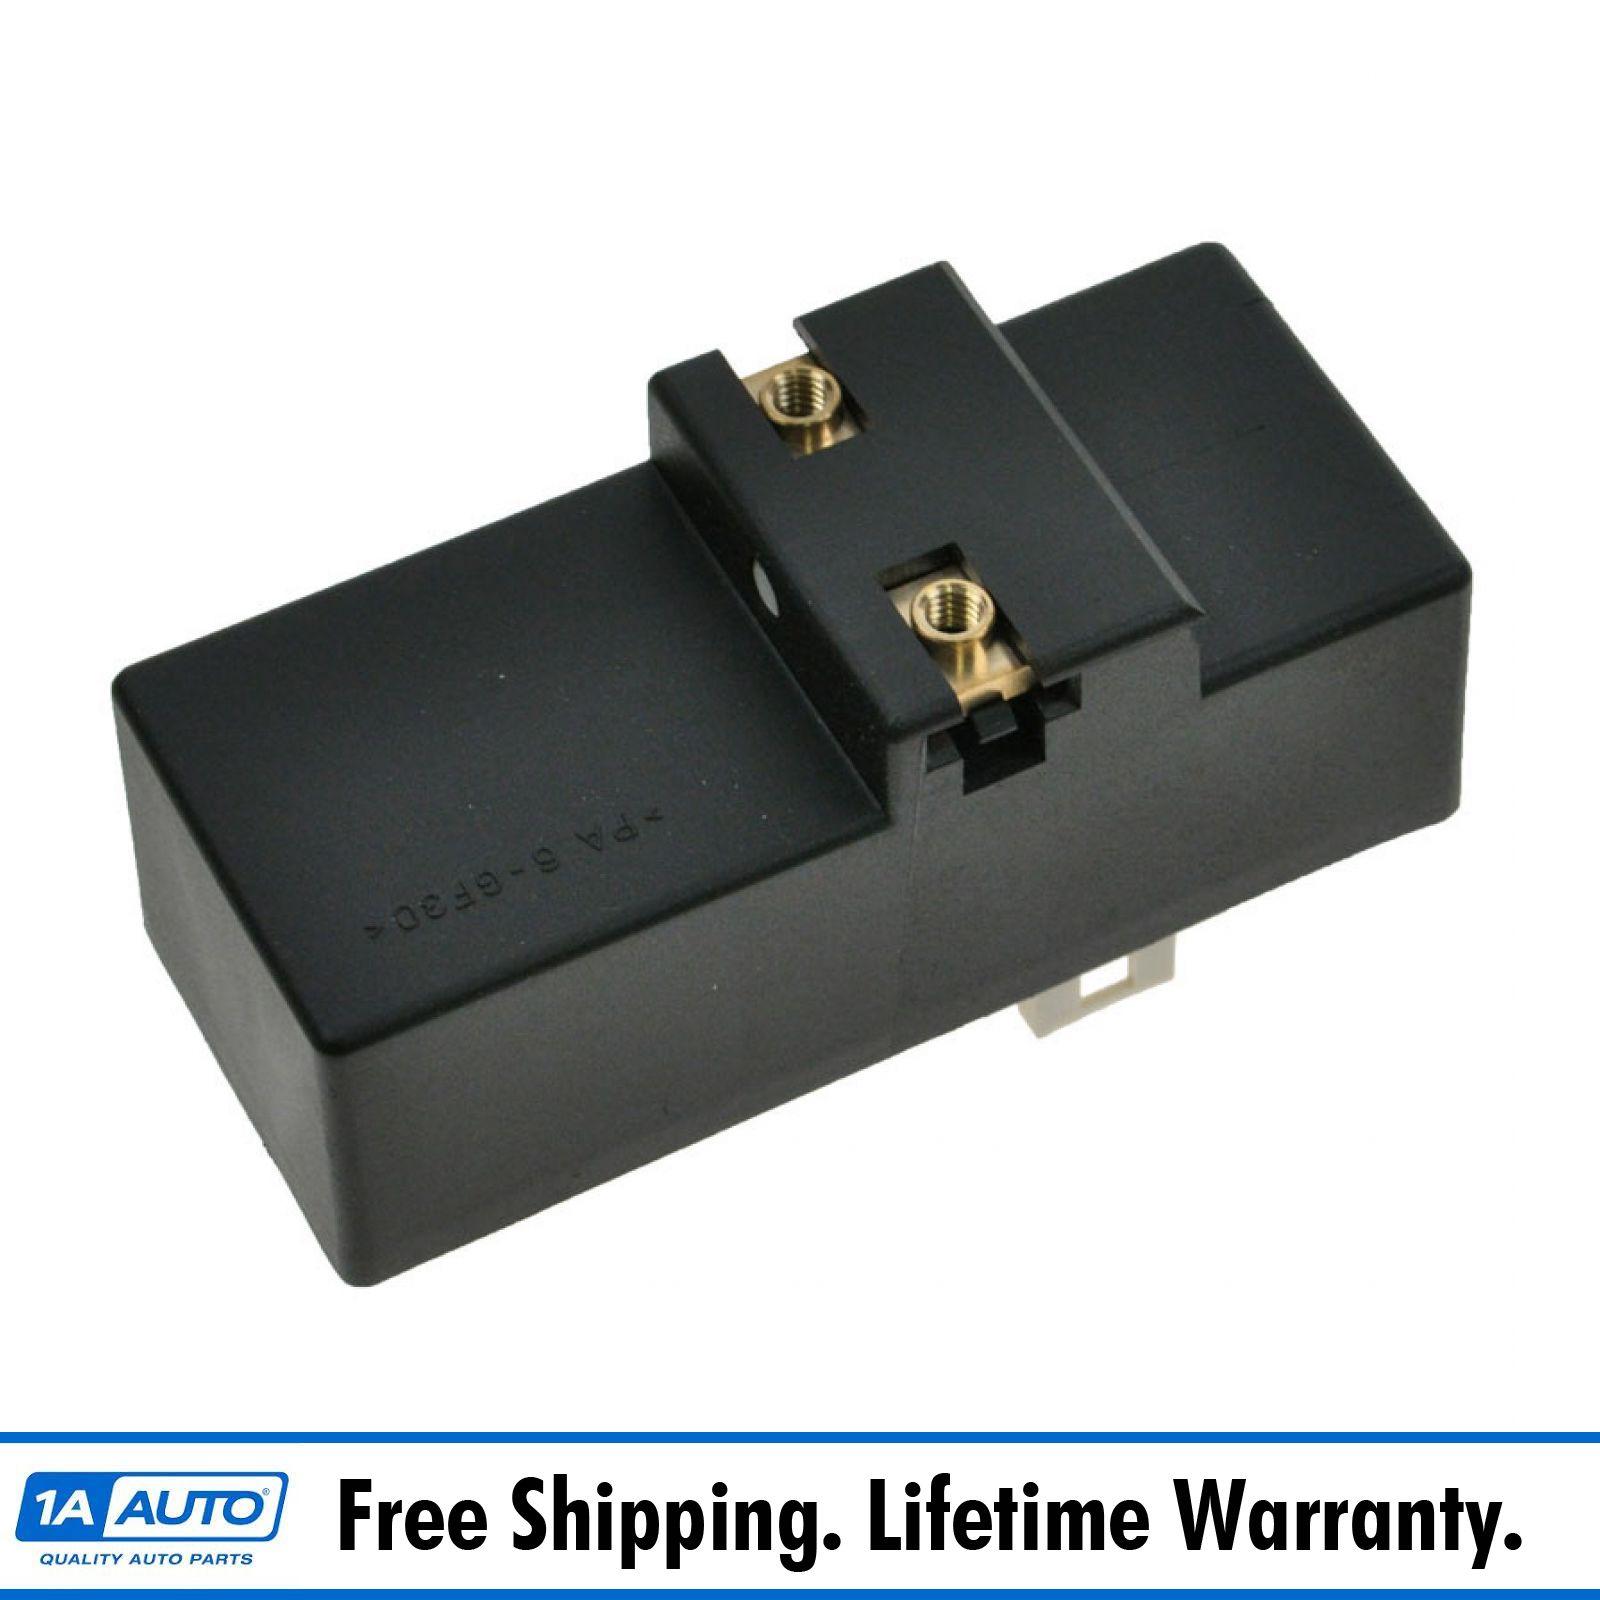 Radiator Cooling Fan Control Module Pressure Switch For Vw